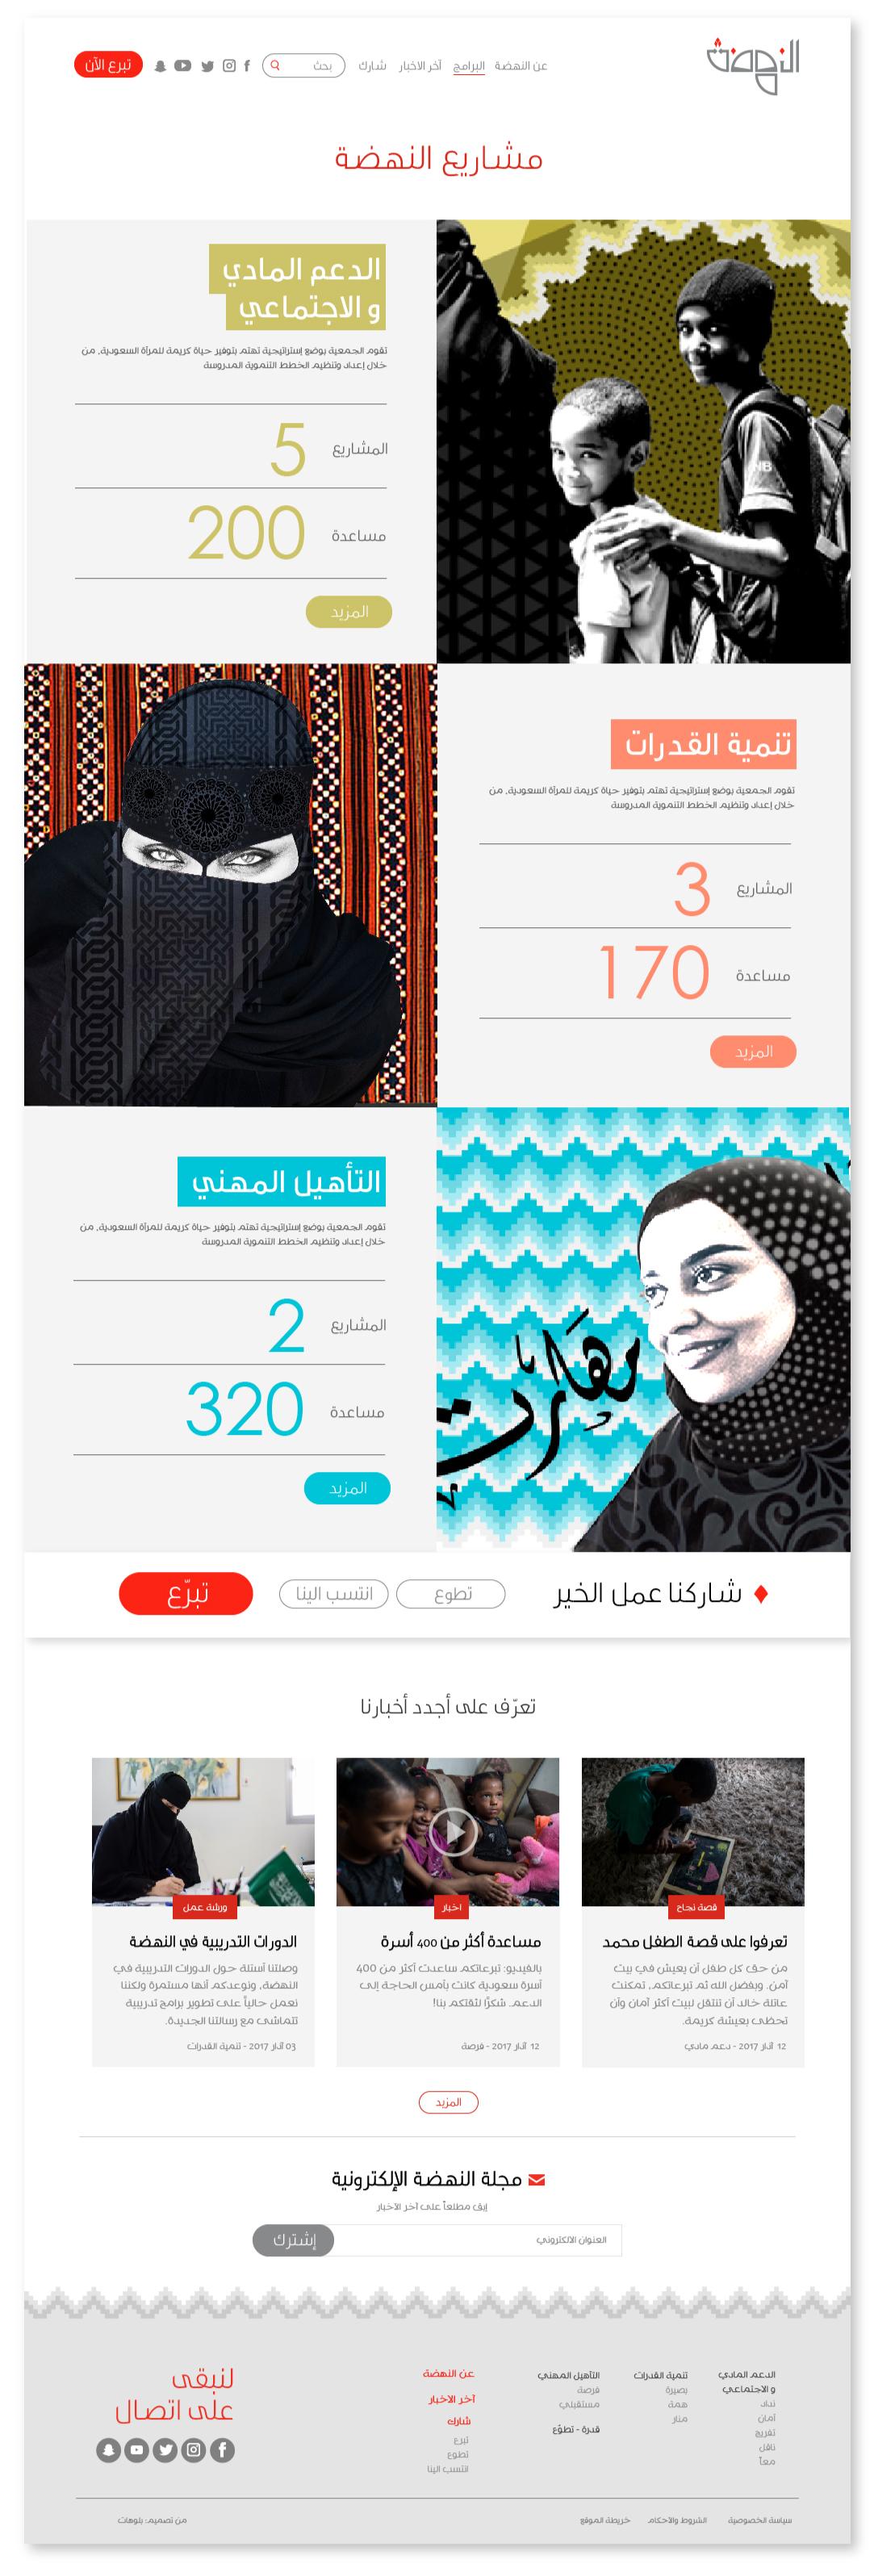 2a-AlNahda-programs.jpg